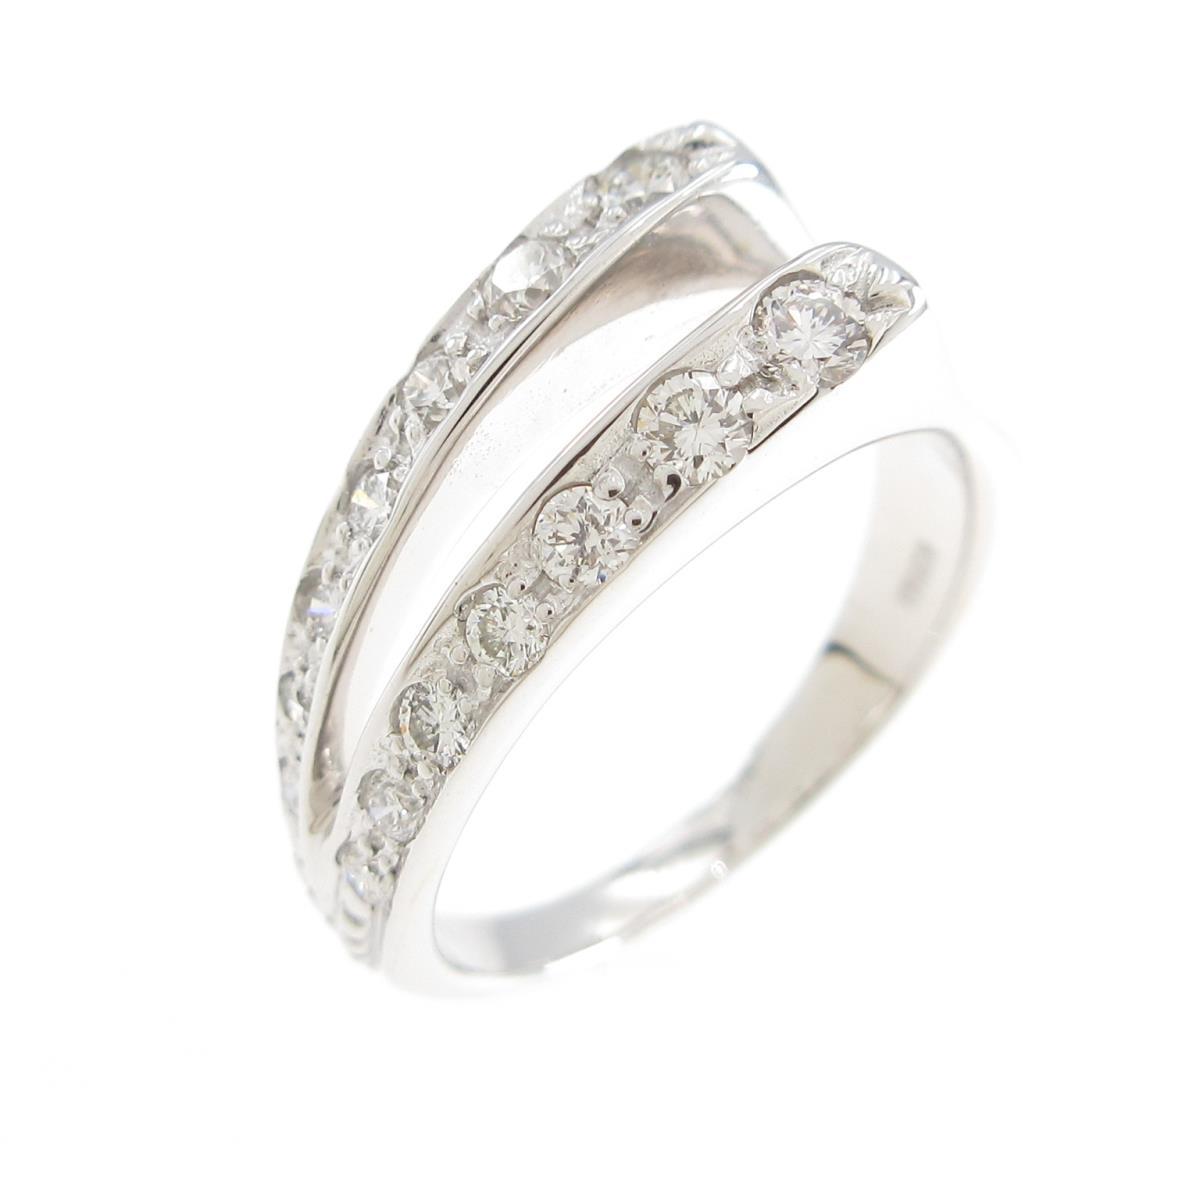 K18WG ダイヤモンドリング オンライン限定商品 通販 激安 中古